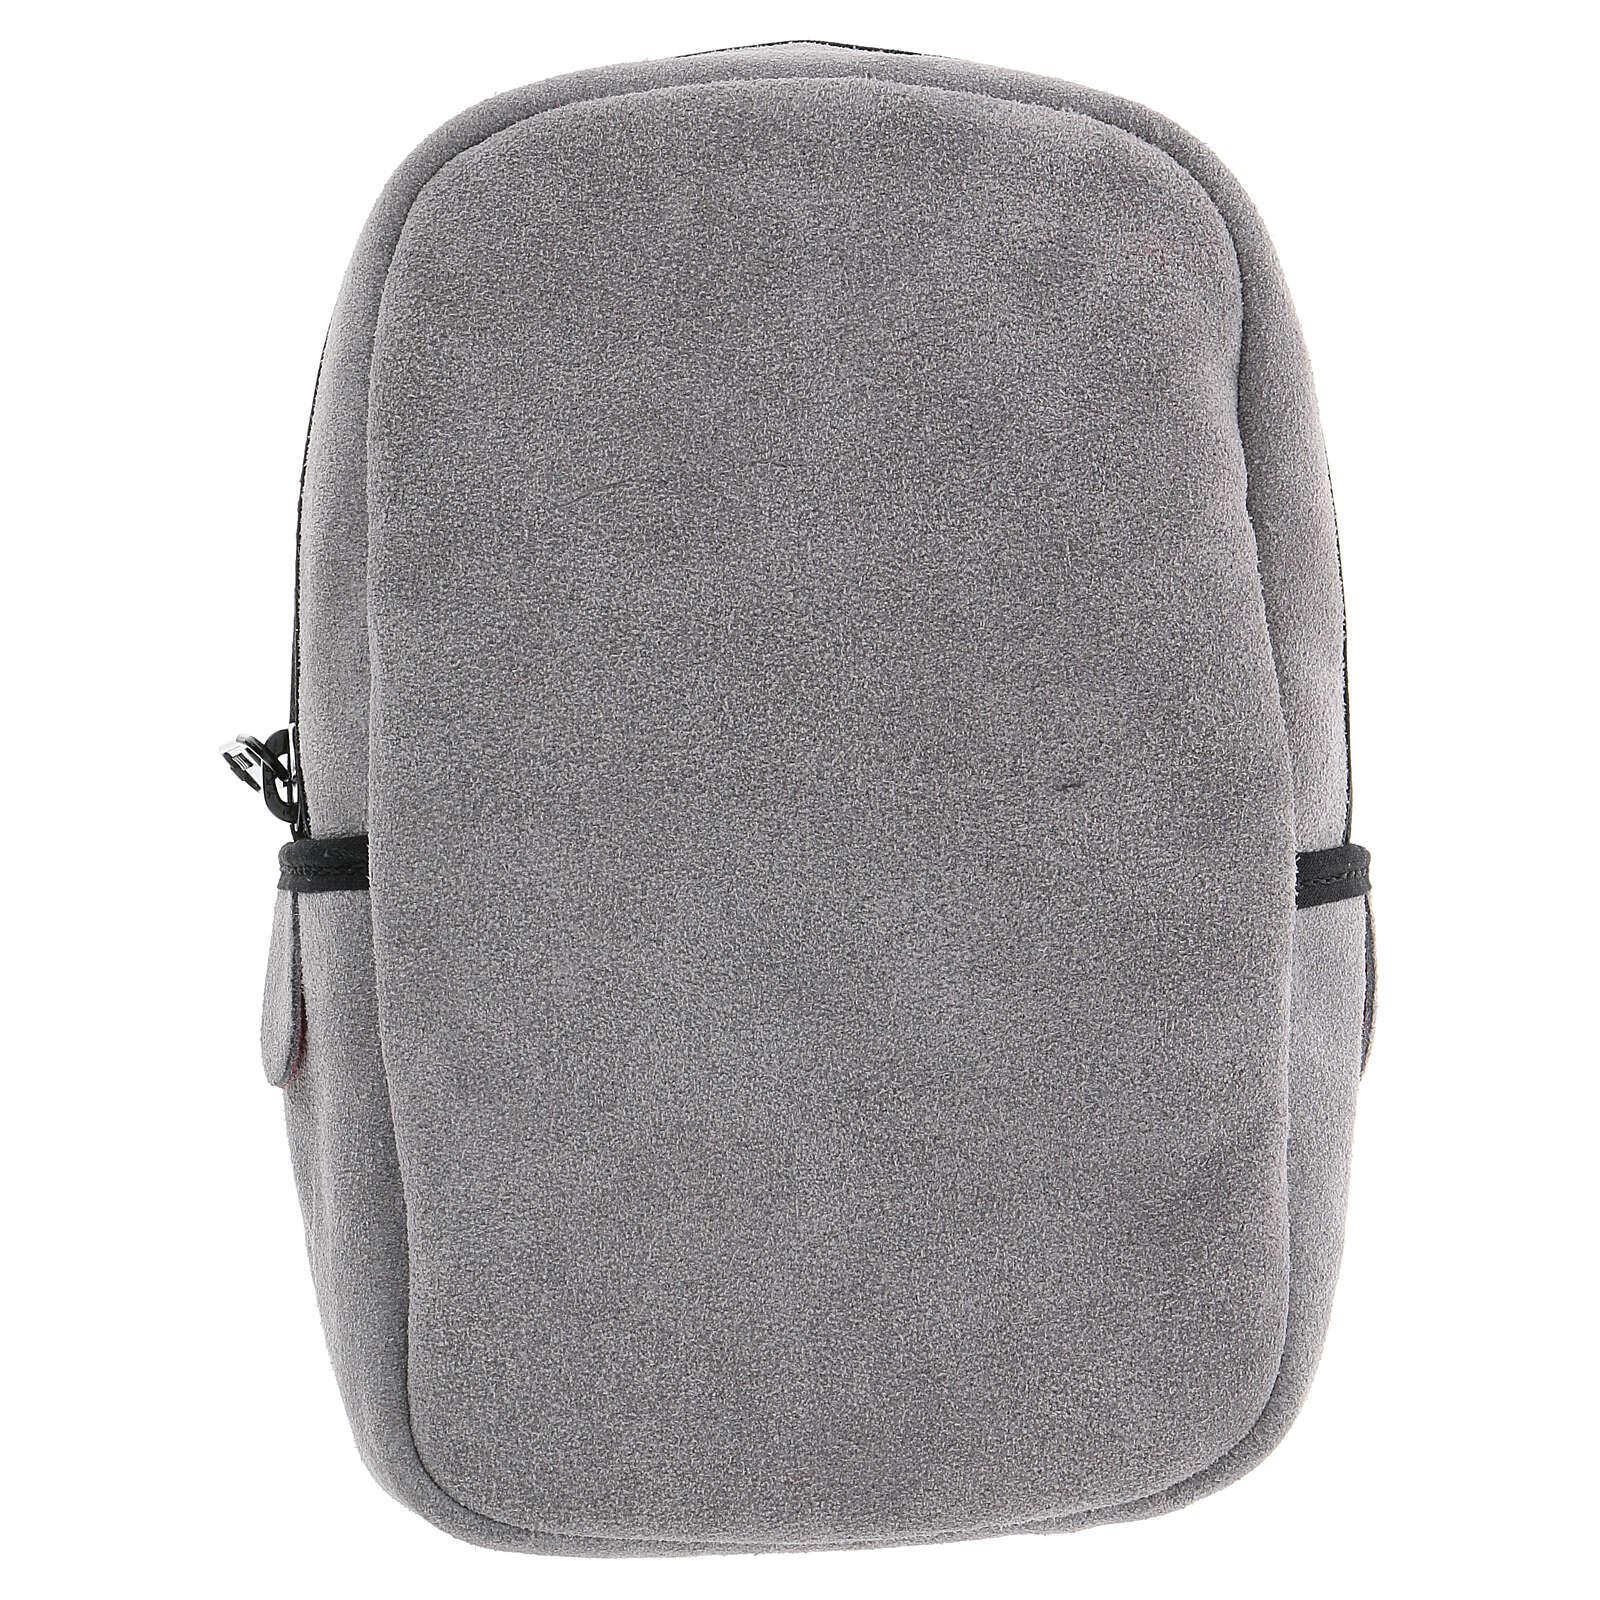 Minitasche fürs Zelebrieren fettgegerbt 3